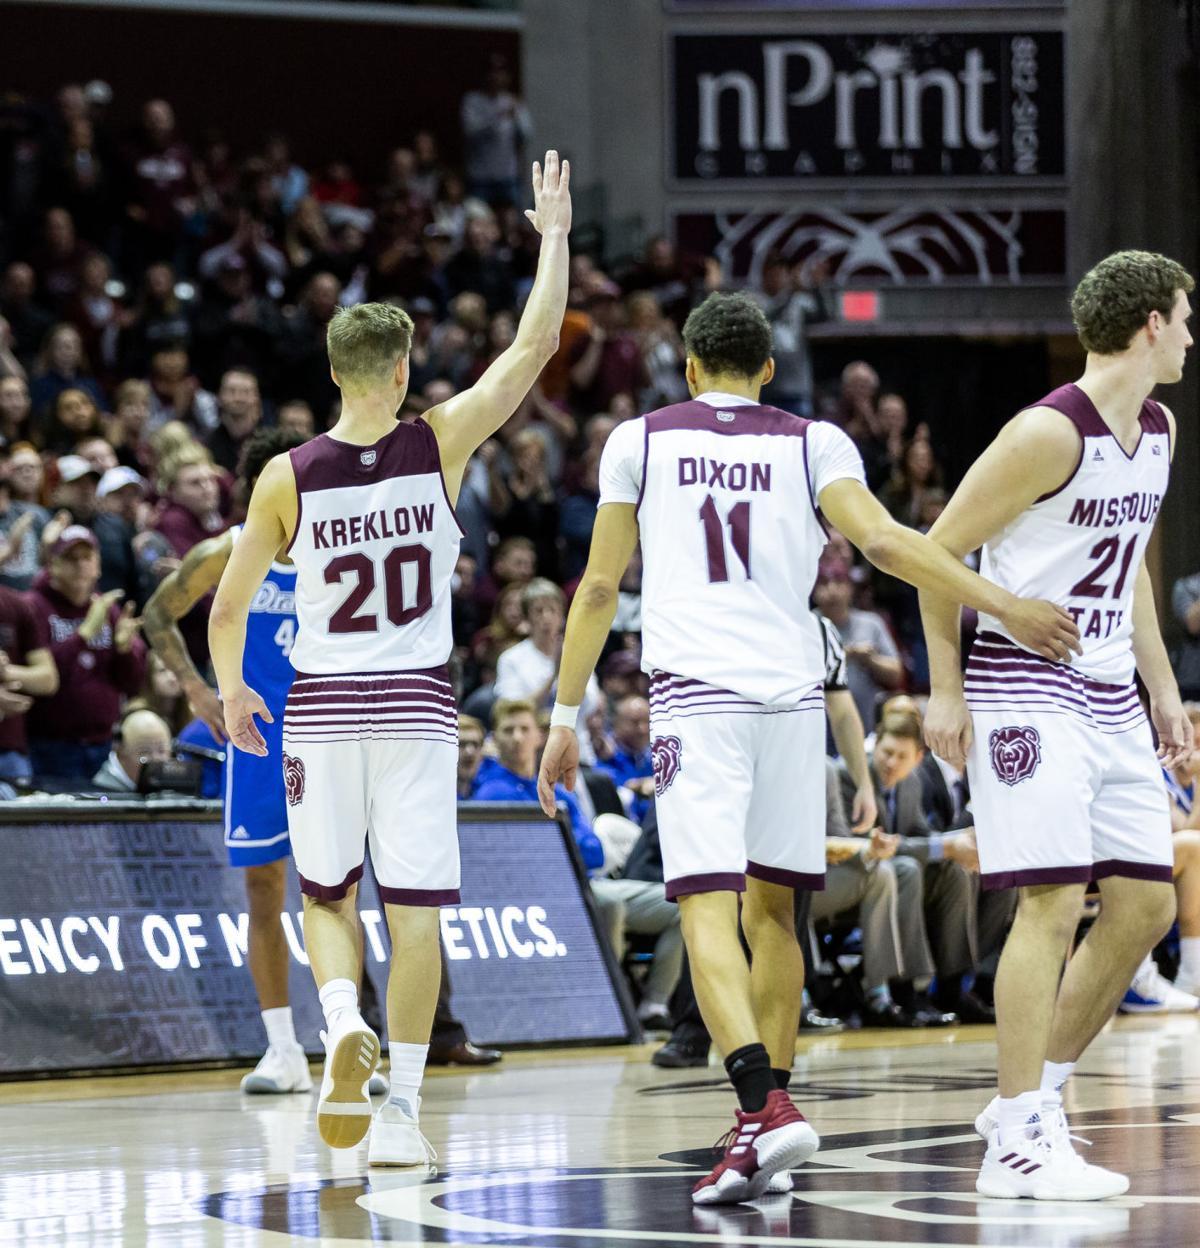 Jarred Dixon, Ryan Kreklow walk off the court